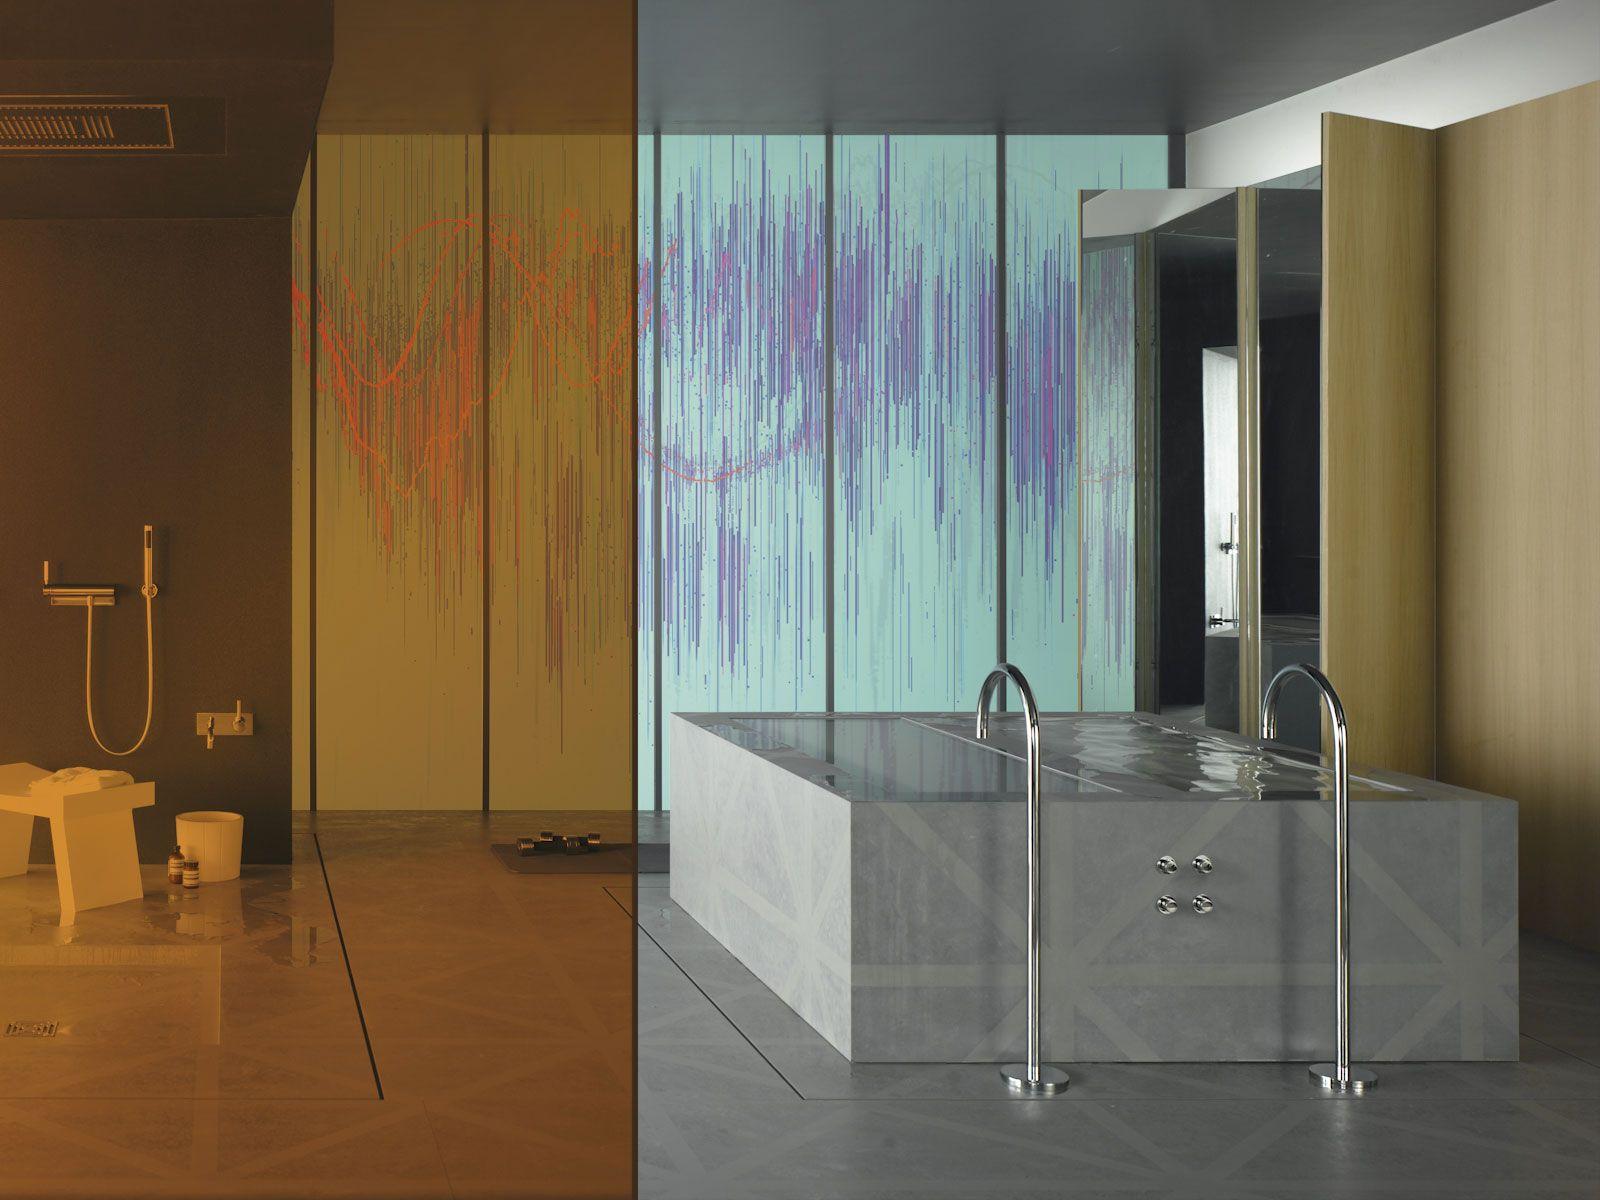 Tara Logic Bath Spa Fitting Dornbracht Bathroom Faucets